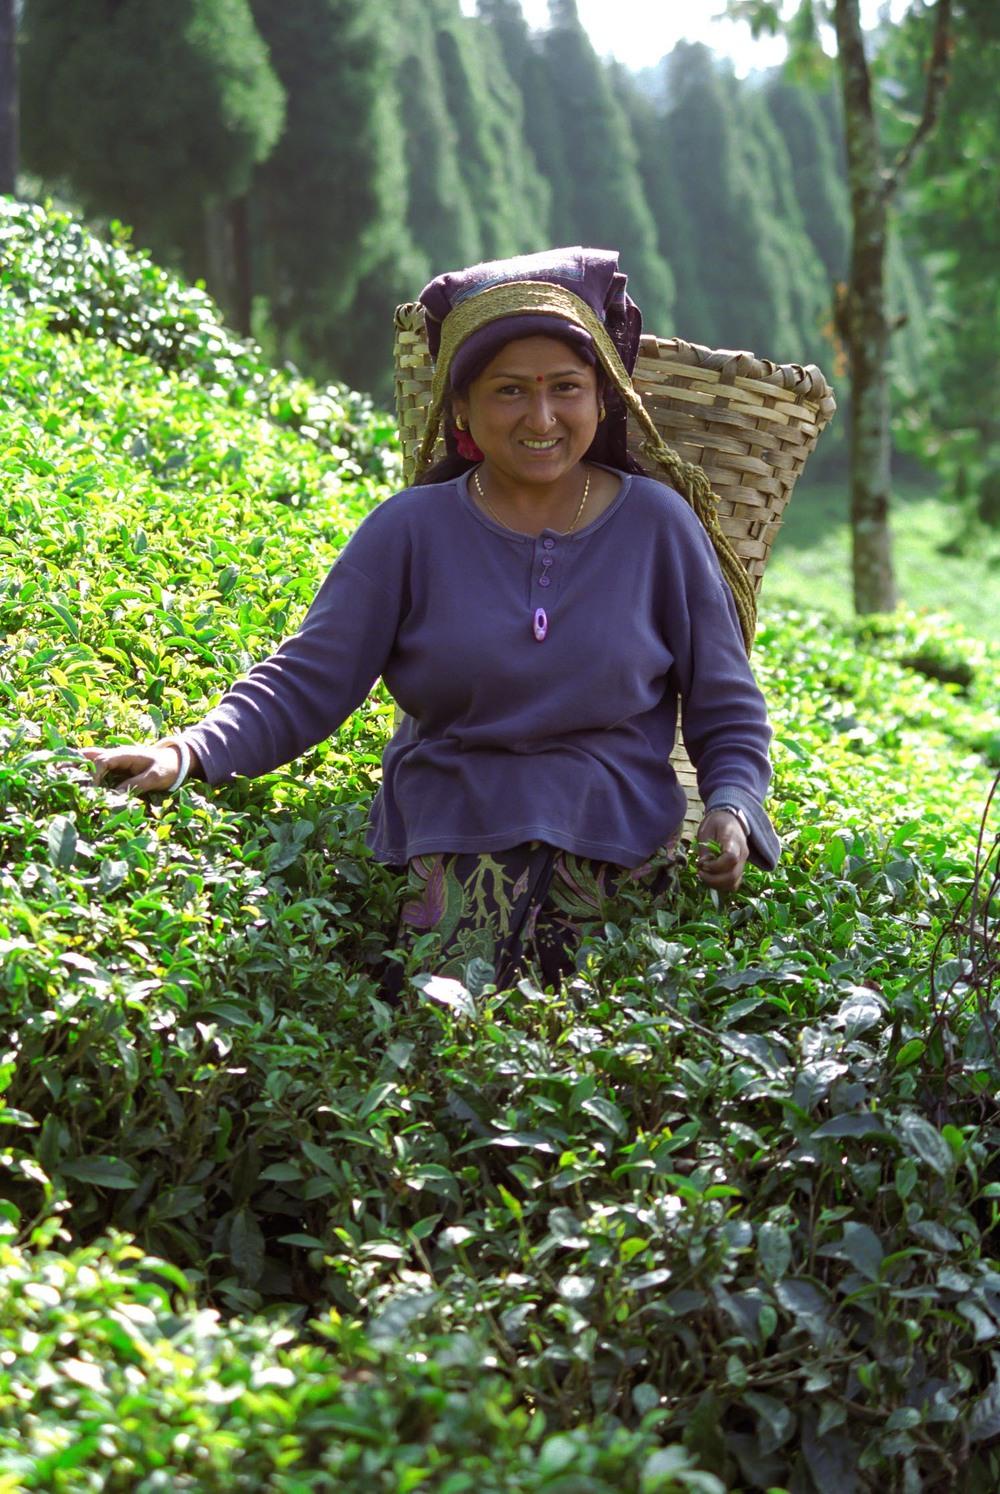 Tea picker in Darjeeling, India